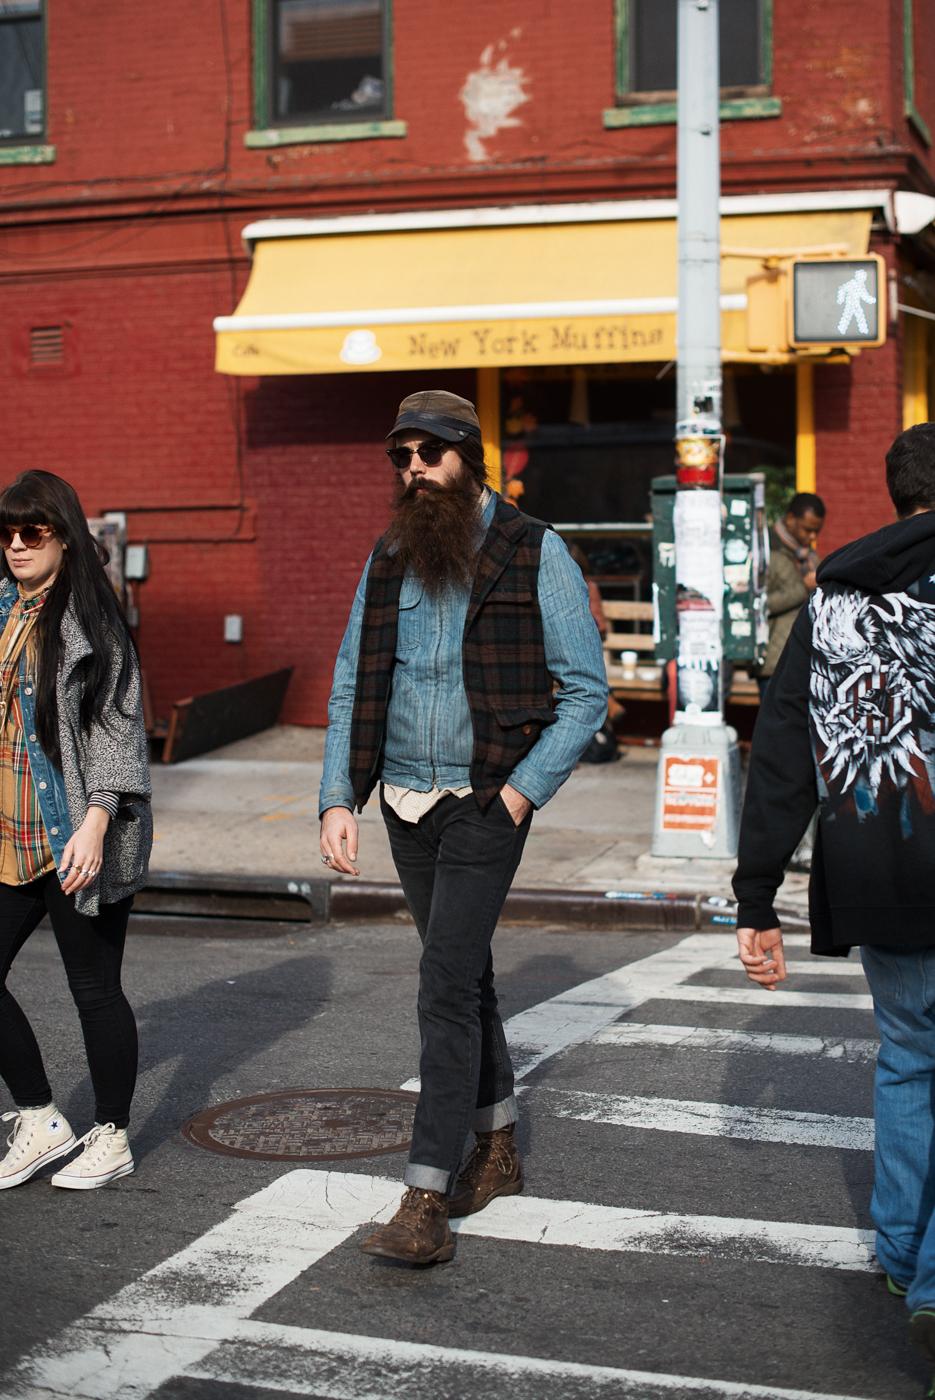 Brooklyn beard.   Similar look:  Denim Jacket in Light Wash  .